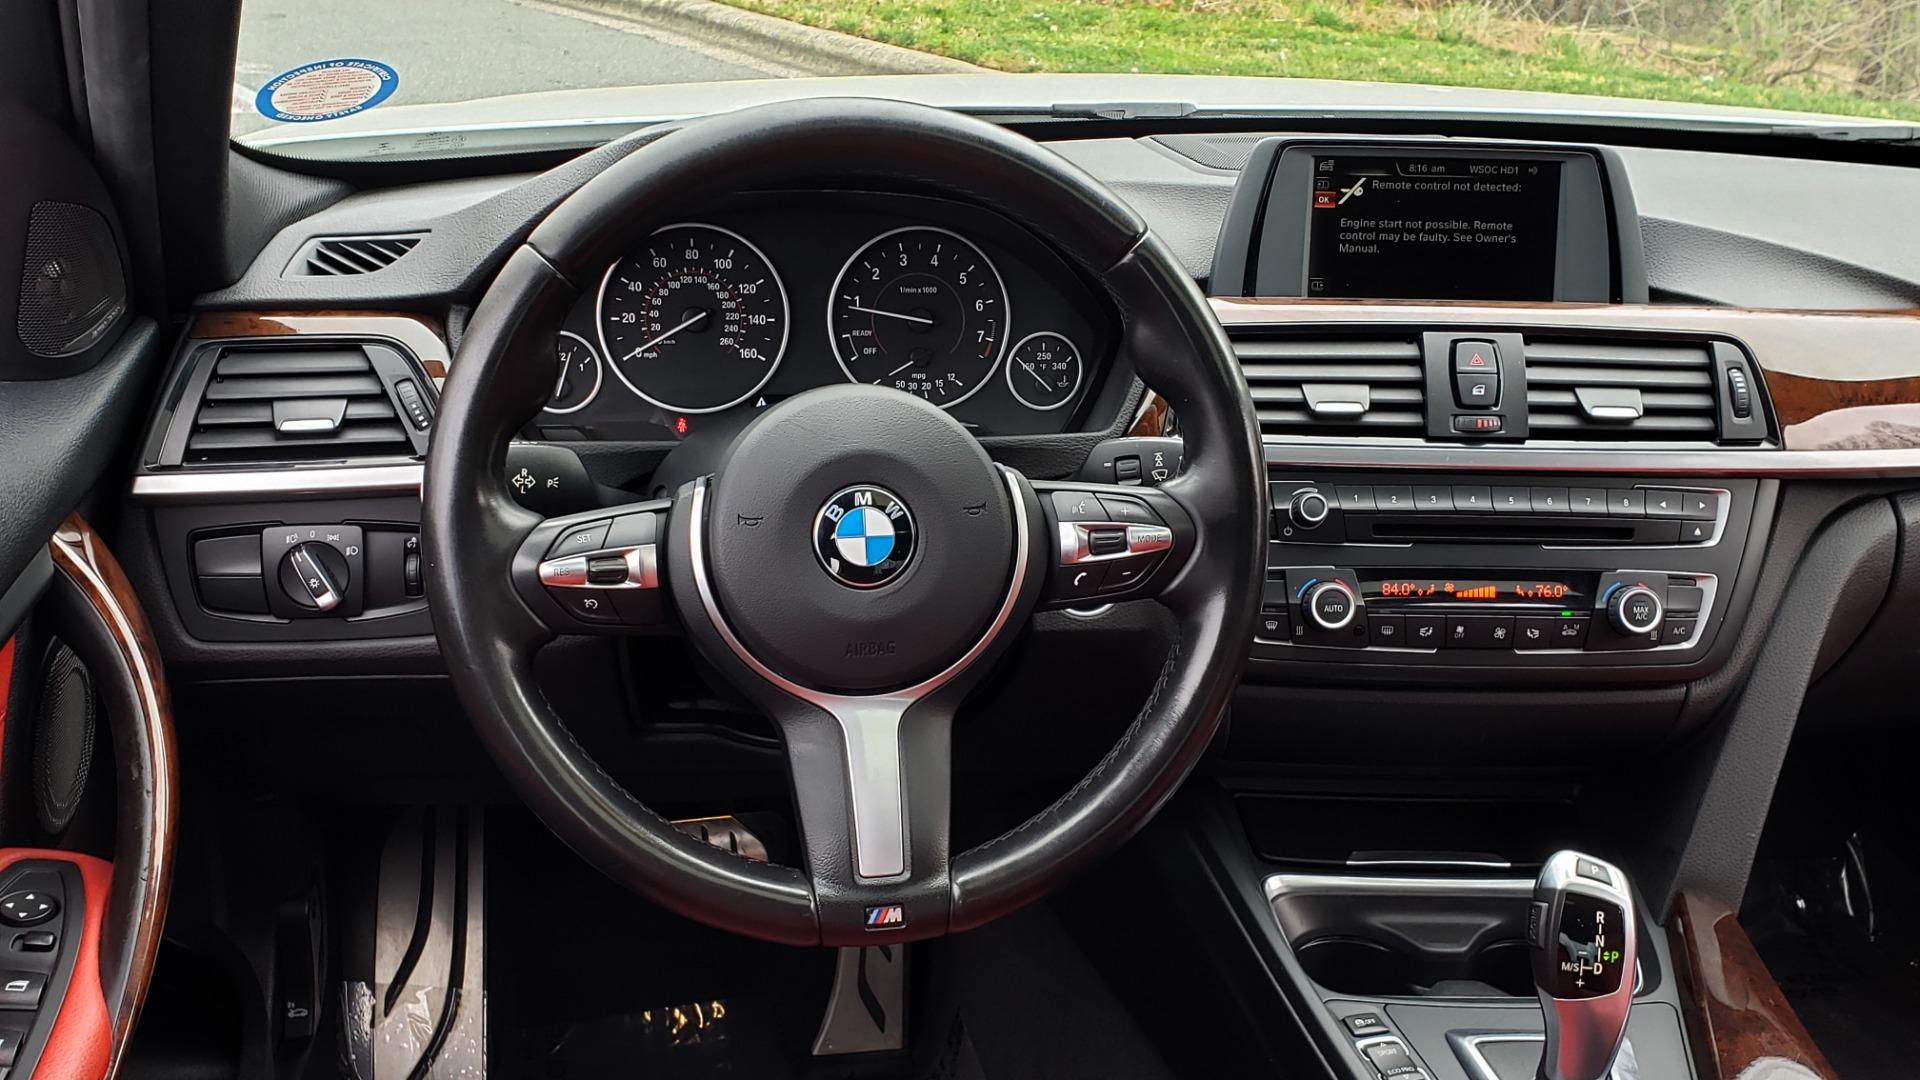 Used 2015 BMW 3 Series 335I M-SPORT / PREM PKG / HK SND / SUNROOF / REARVIEW for sale Sold at Formula Imports in Charlotte NC 28227 39